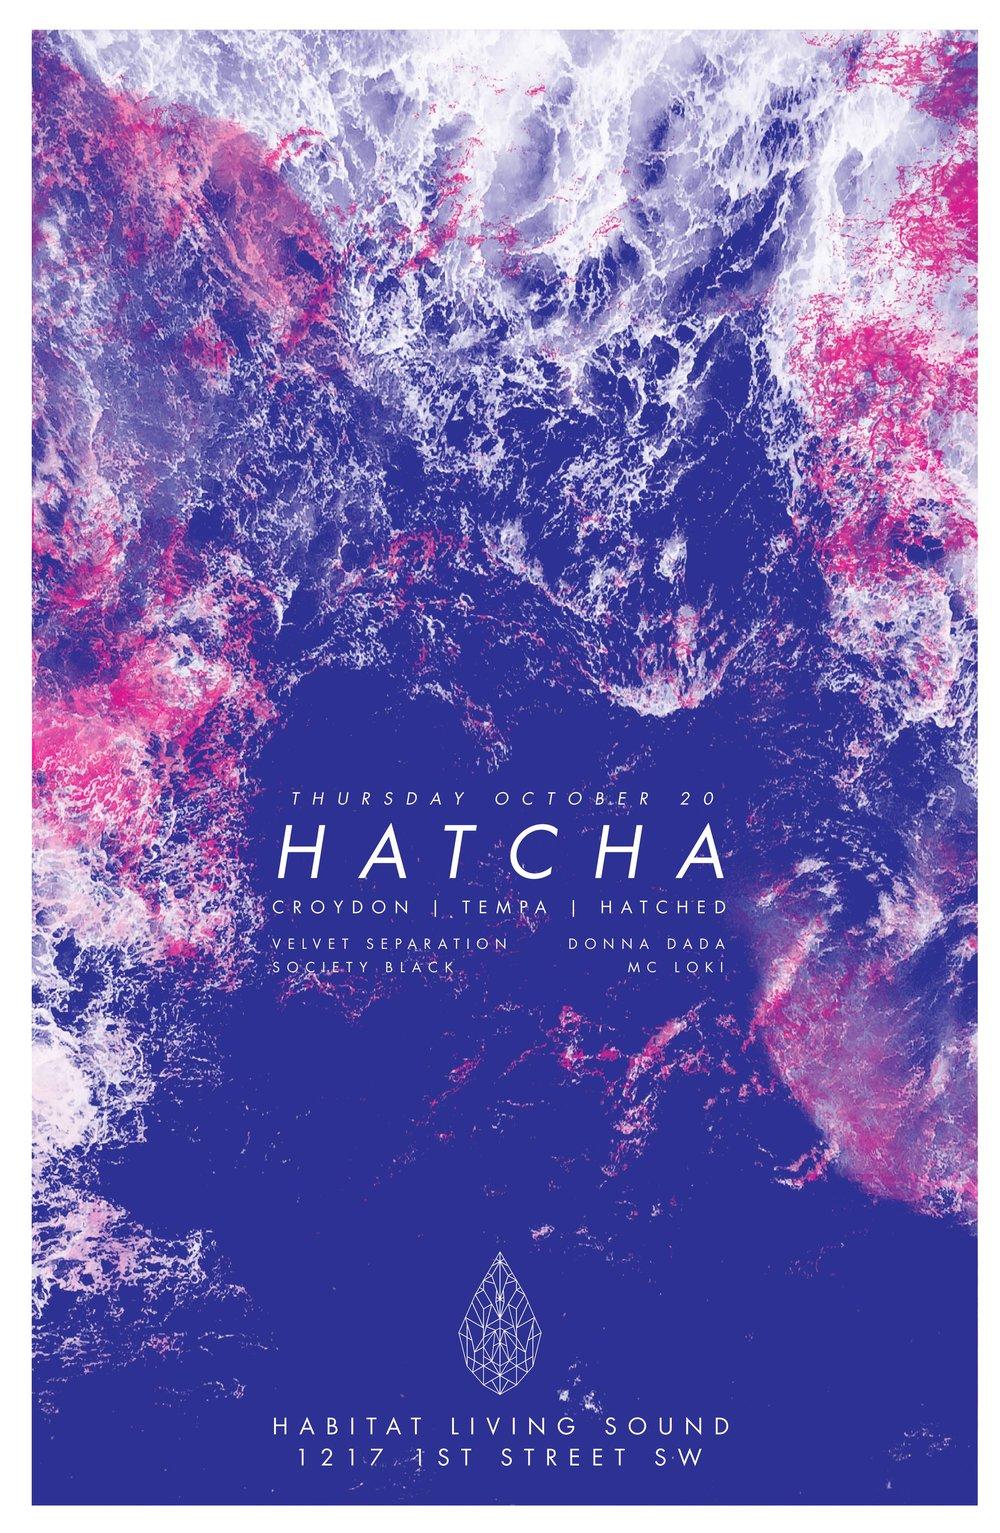 hatcha-habitat-living-sound.jpeg